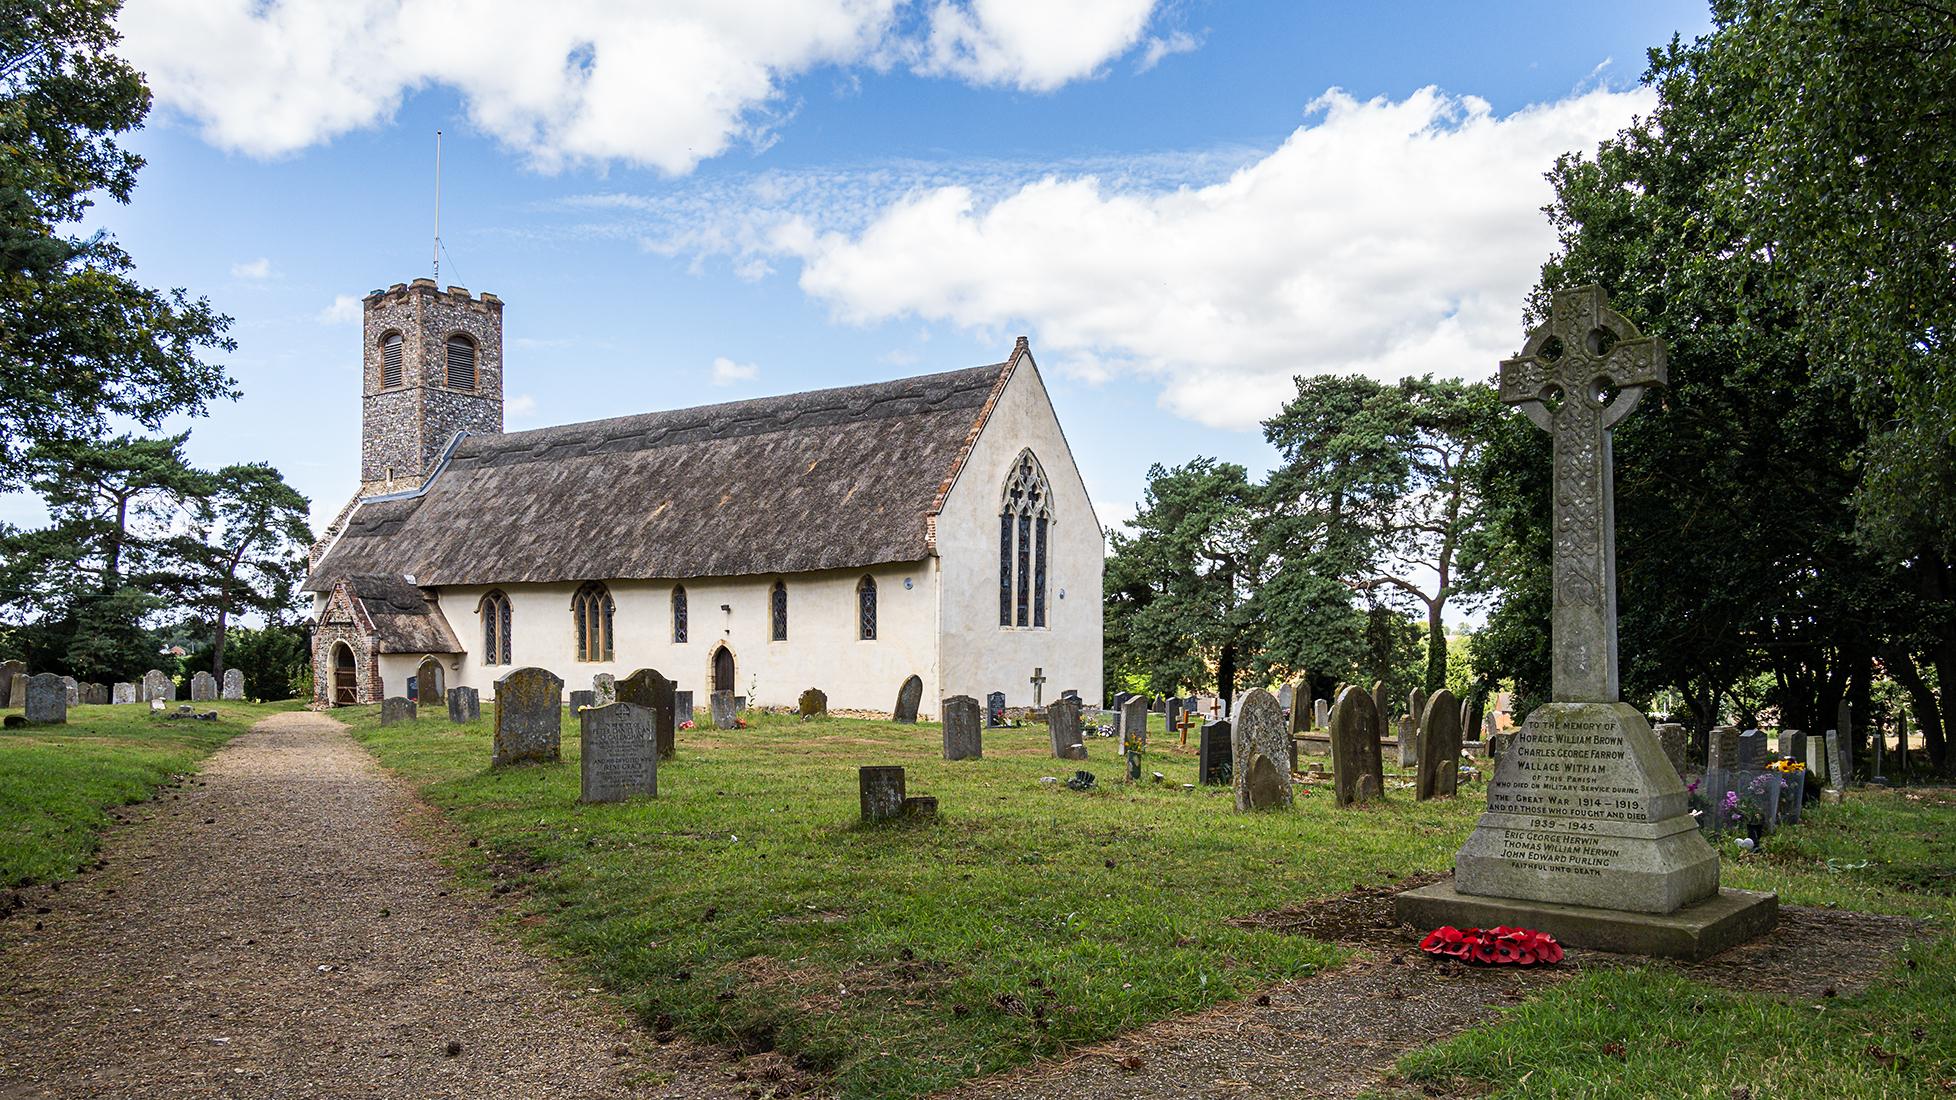 St Ethelbert's Church, Thurton